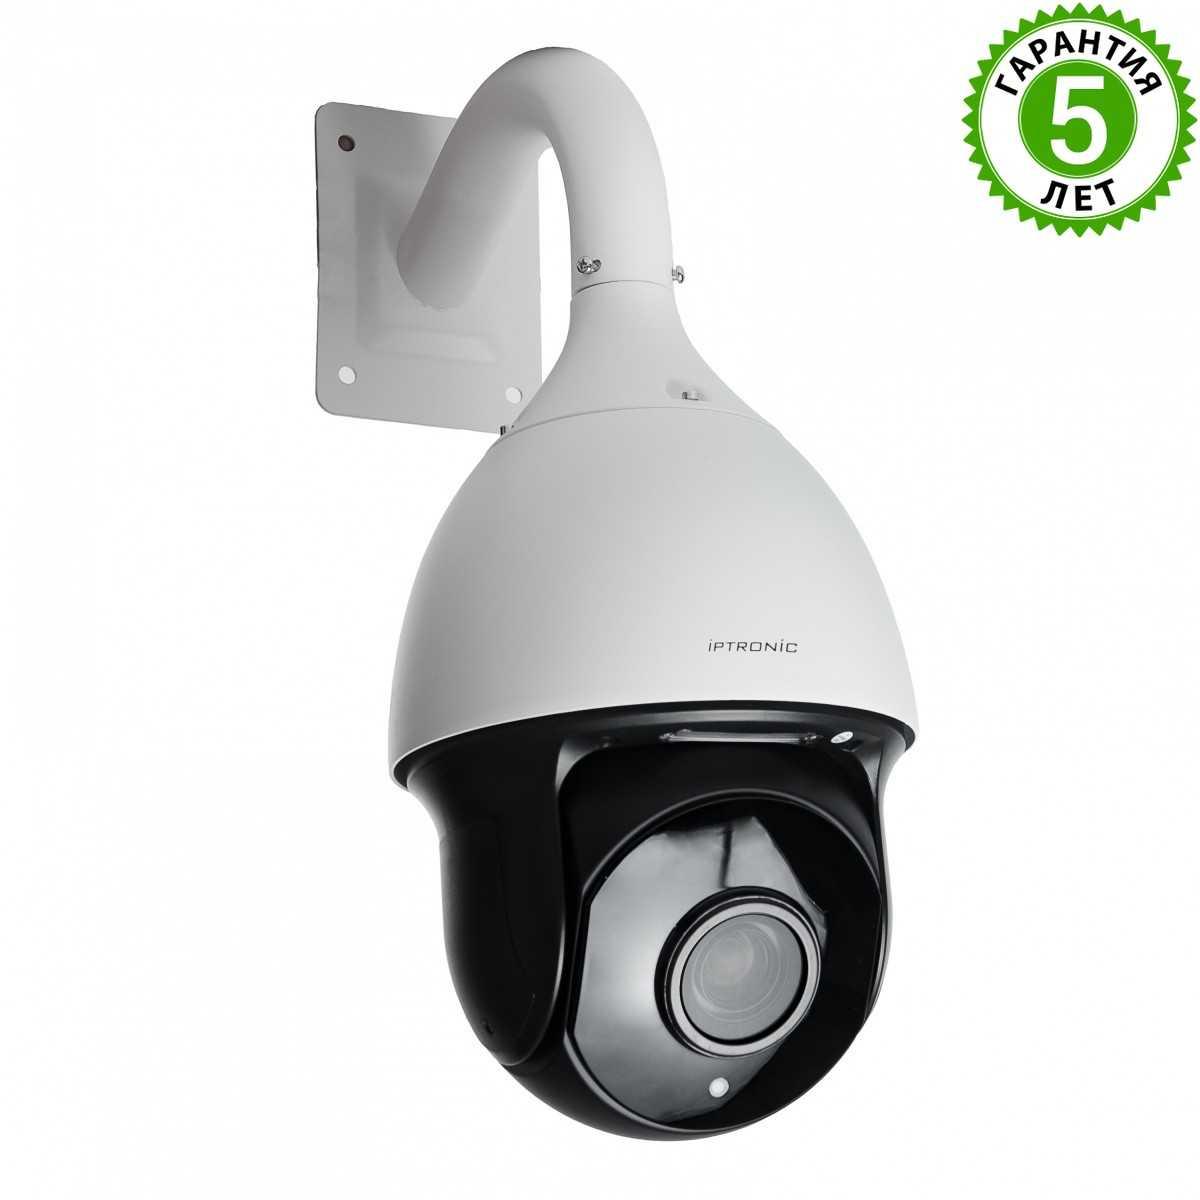 Видеокамера IPTRONIC IP7HS200(22X) IR120P